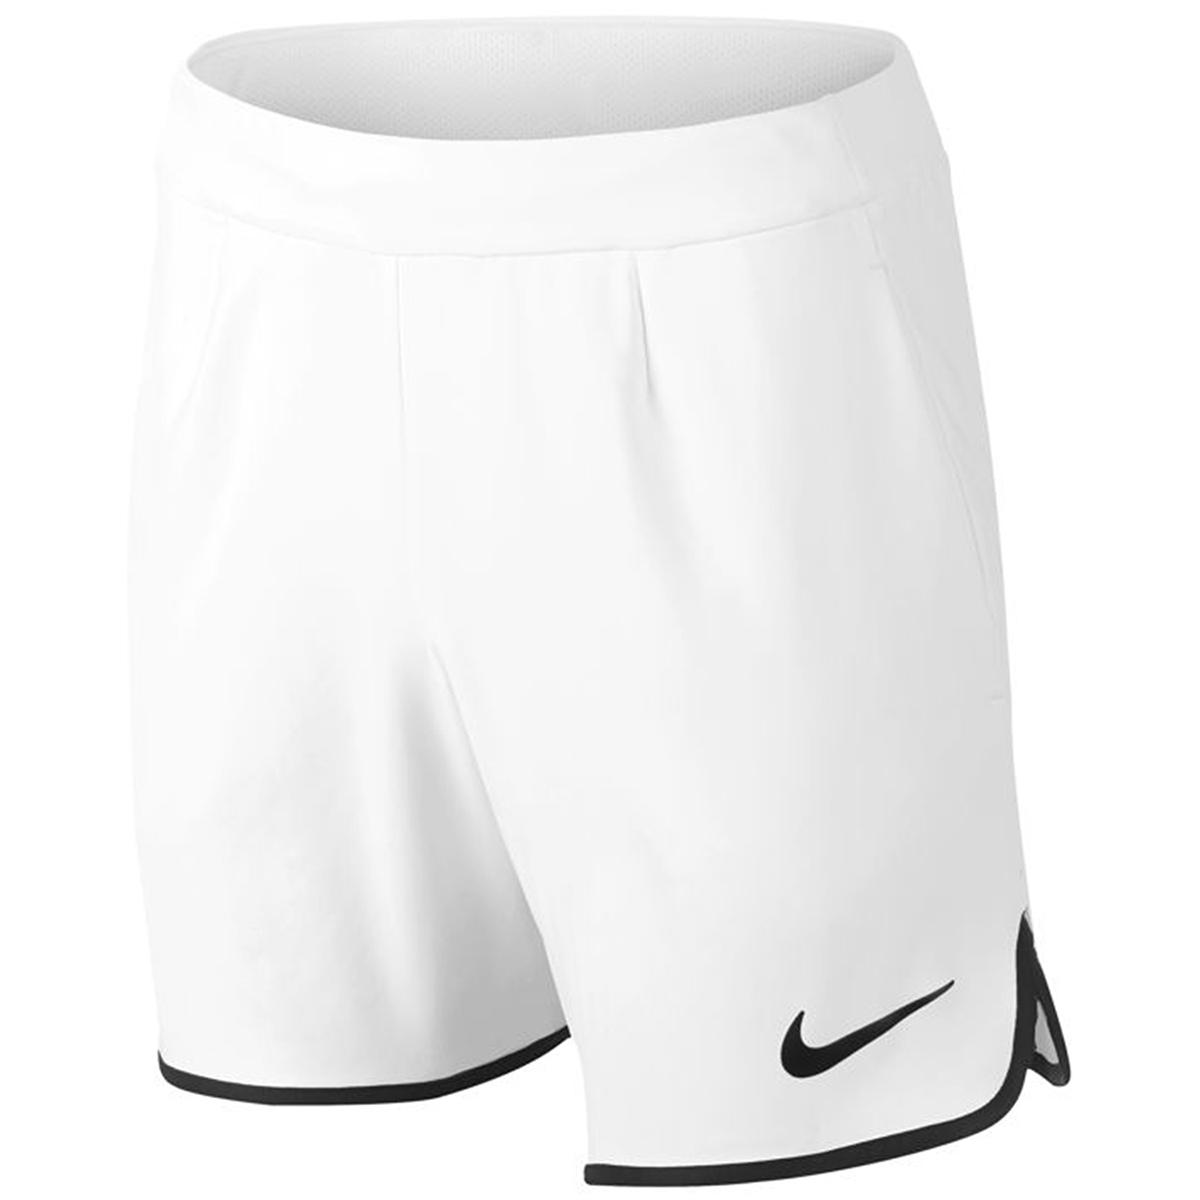 3e0d43c884 Nike Flex Gladiator tennis Short 6 in kisfiú tenisz ruházat - Match ...